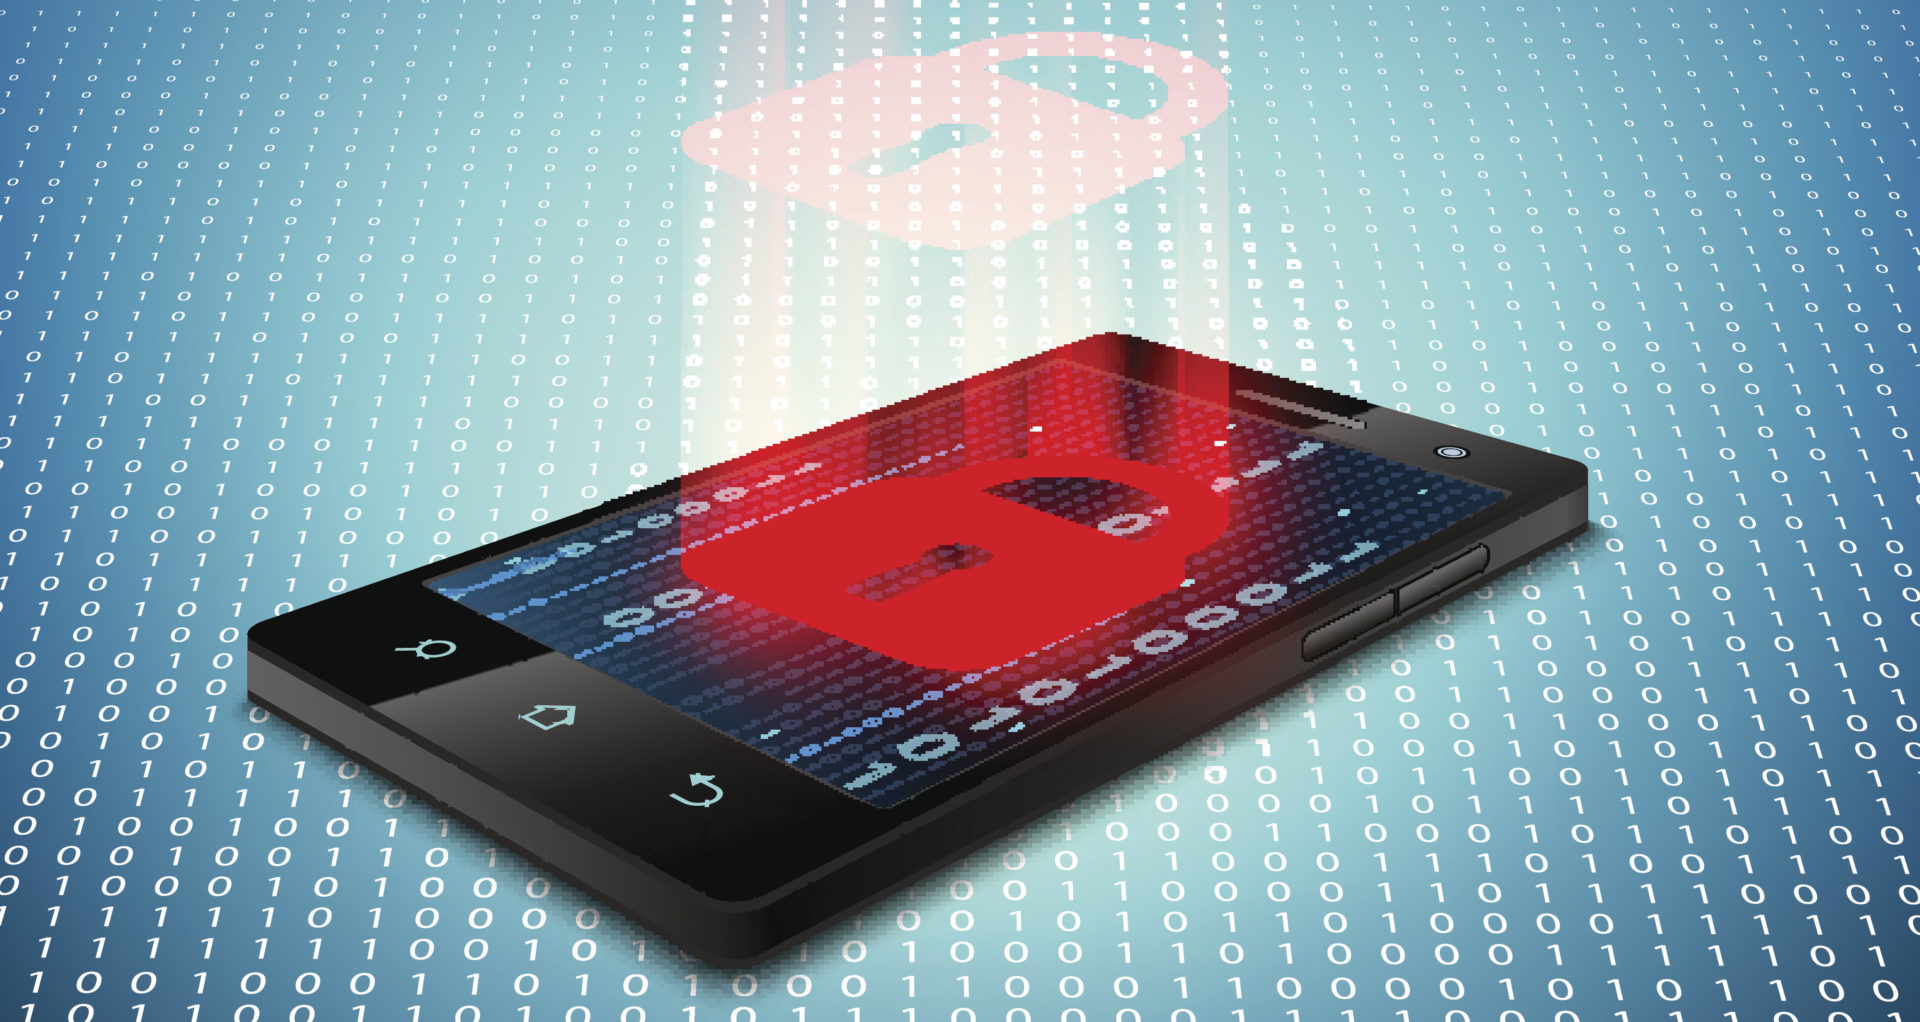 seguridad-movil-telefono-ciberseguridad-bbva-e1518443032593-1920x1022.jpg (1920×1022)